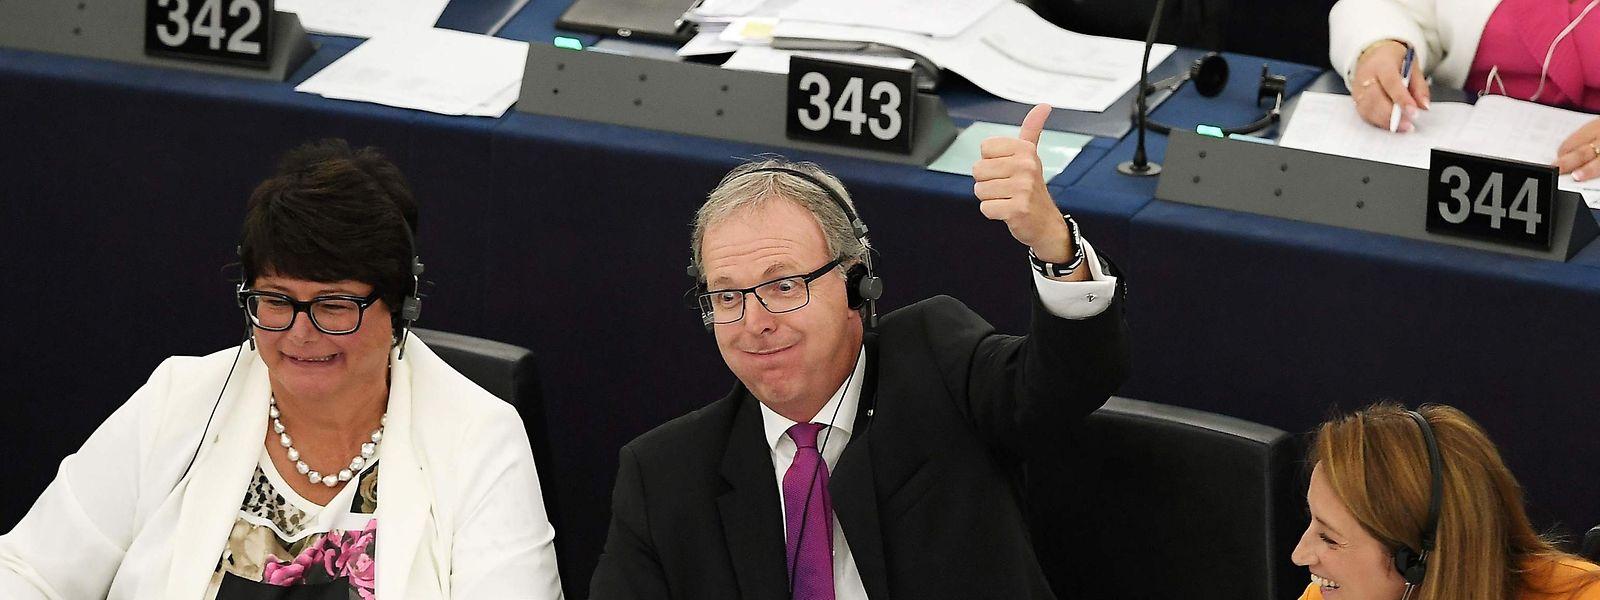 EU-Parlamentsmitglied und Berichterstatter Axel Voss (CDU) reagiert direkt nach der Abstimmung.